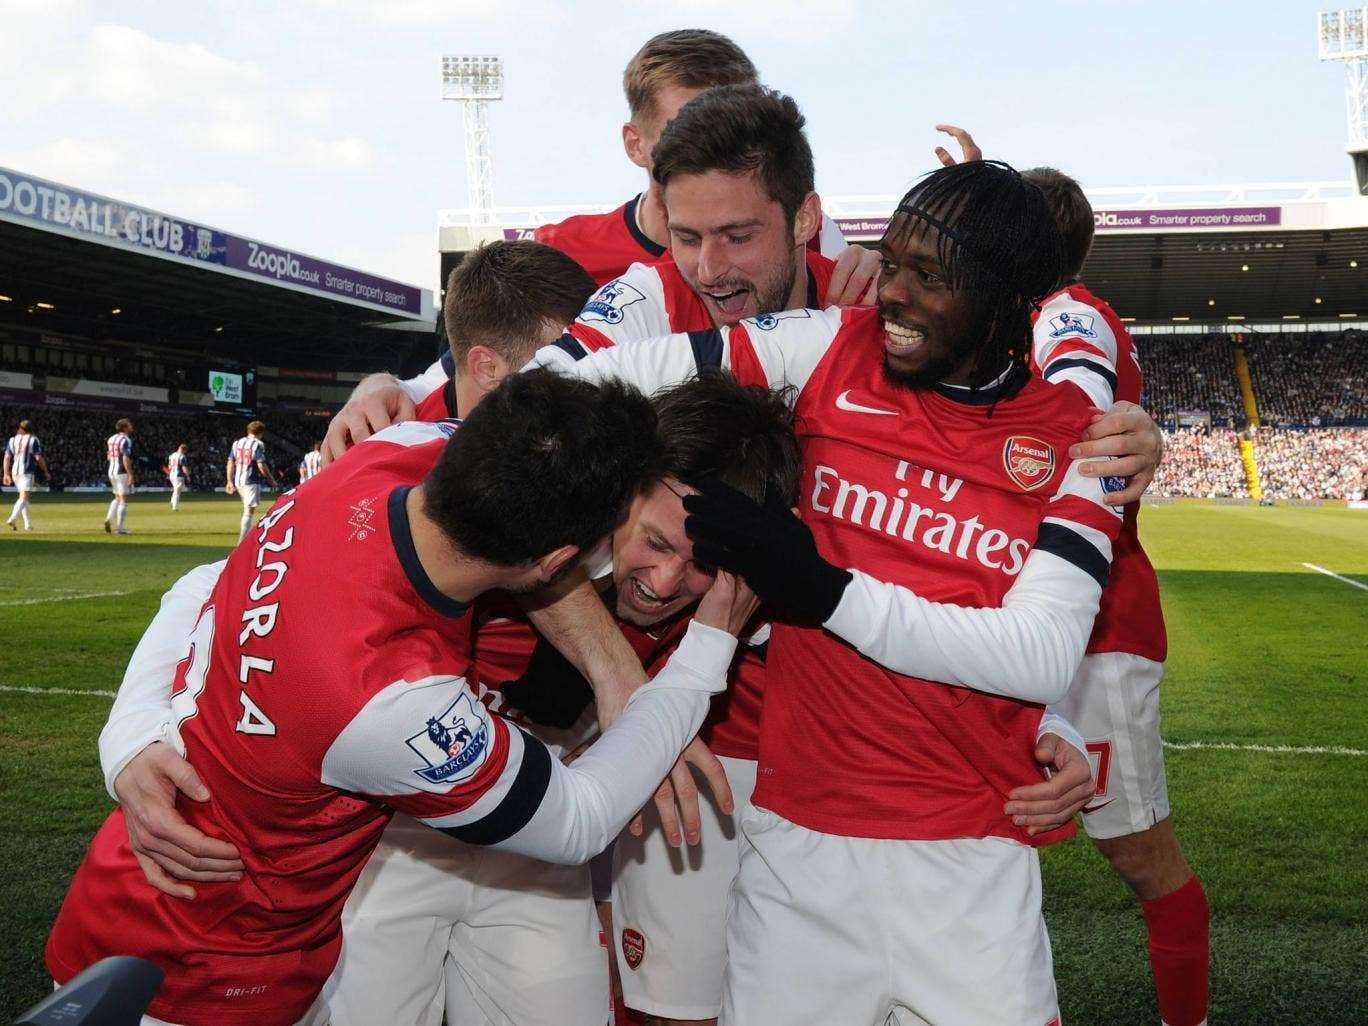 Tomas Rosicky celebrates scoring against West Brom with Arsenal team-mates Santi Cazorla, Aaron Ramsey, Per Mertesacker, Olivier Giroud and Gervinho